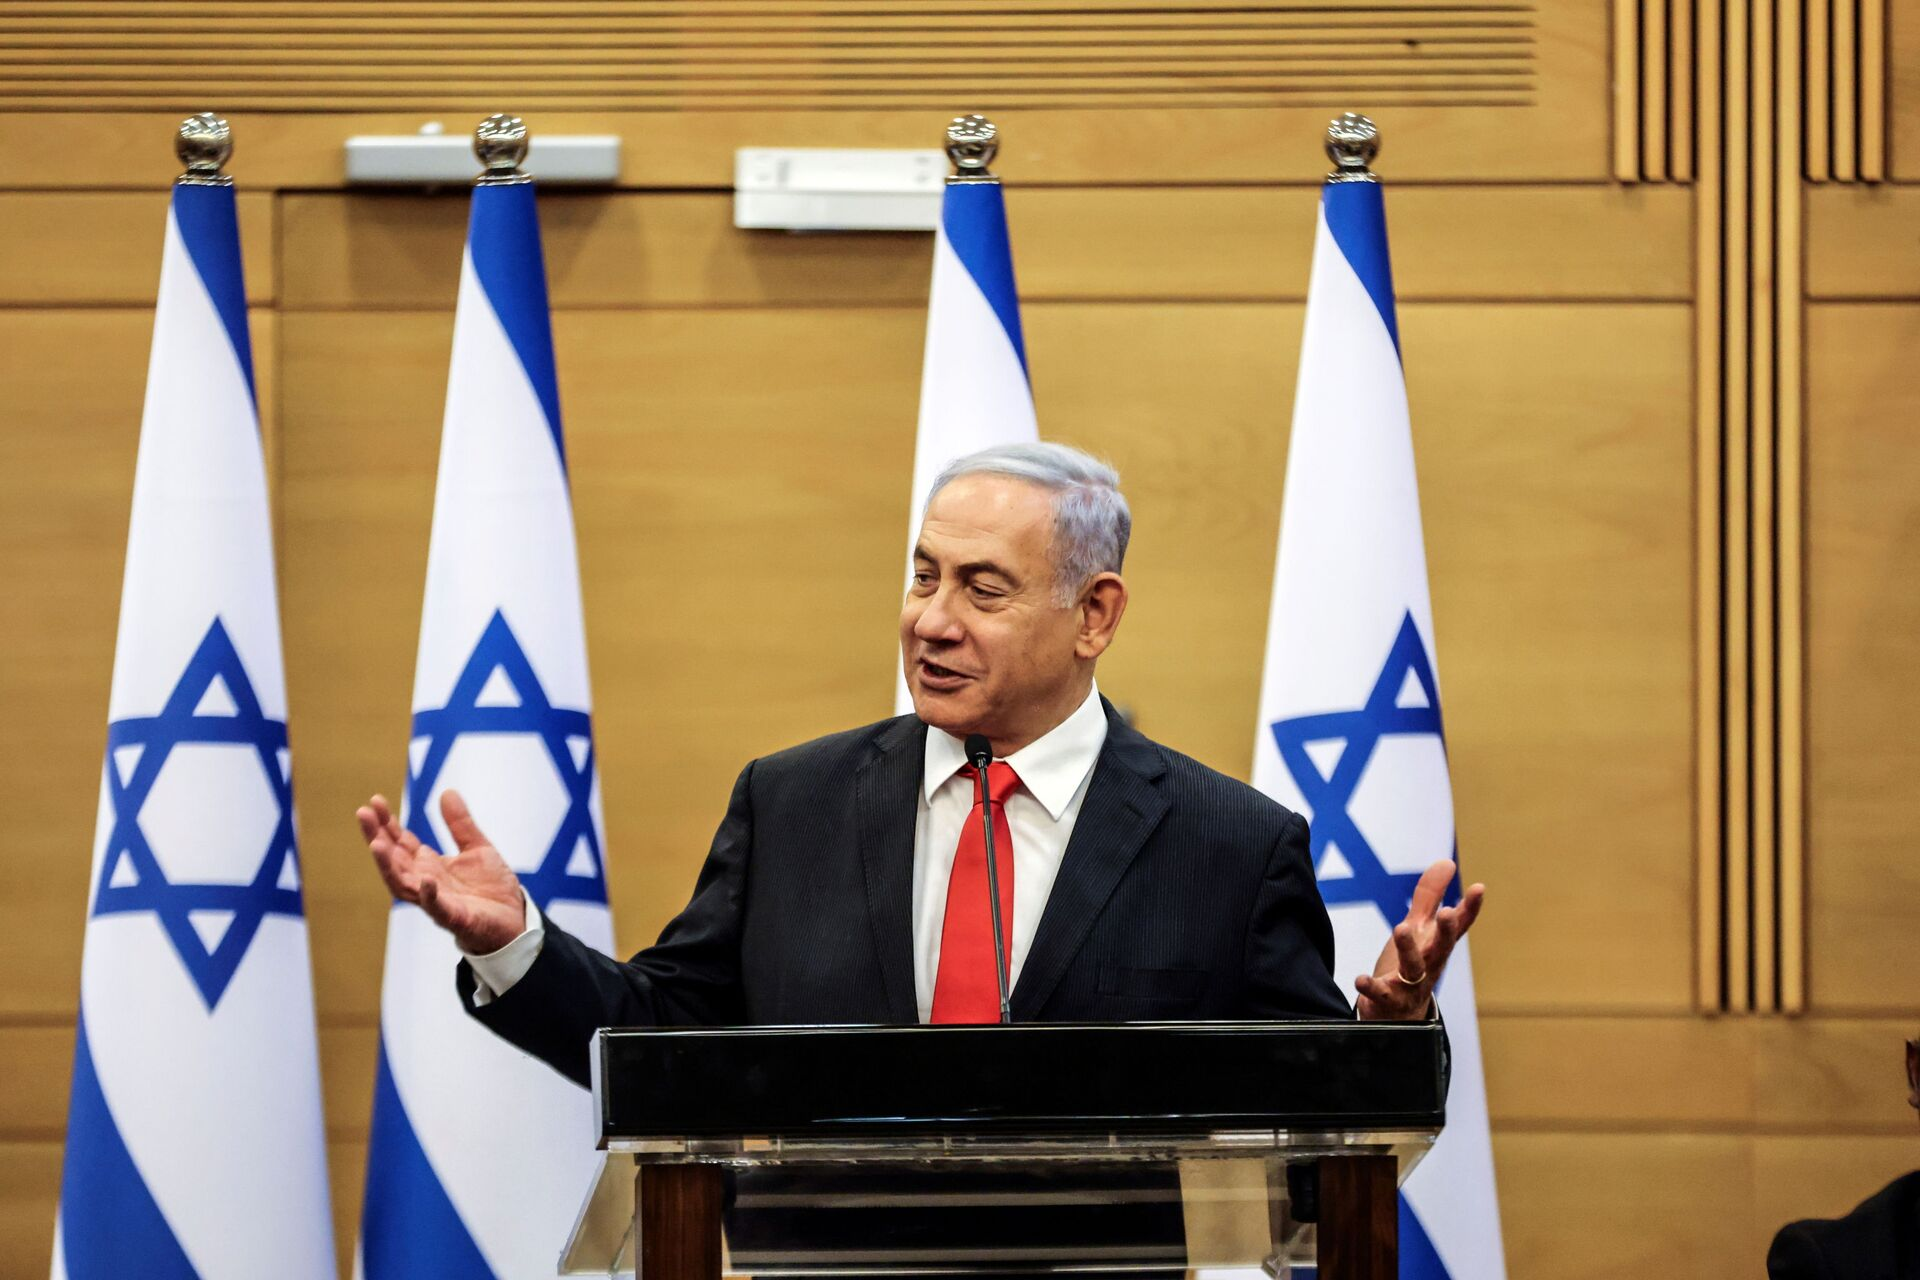 Leader of Israeli Opposition Benjamin Netanyahu speaks during a meeting with his Likud party in the Knesset, the Israeli parliament, in Jerusalem June 14, 2021.  - Sputnik International, 1920, 07.09.2021